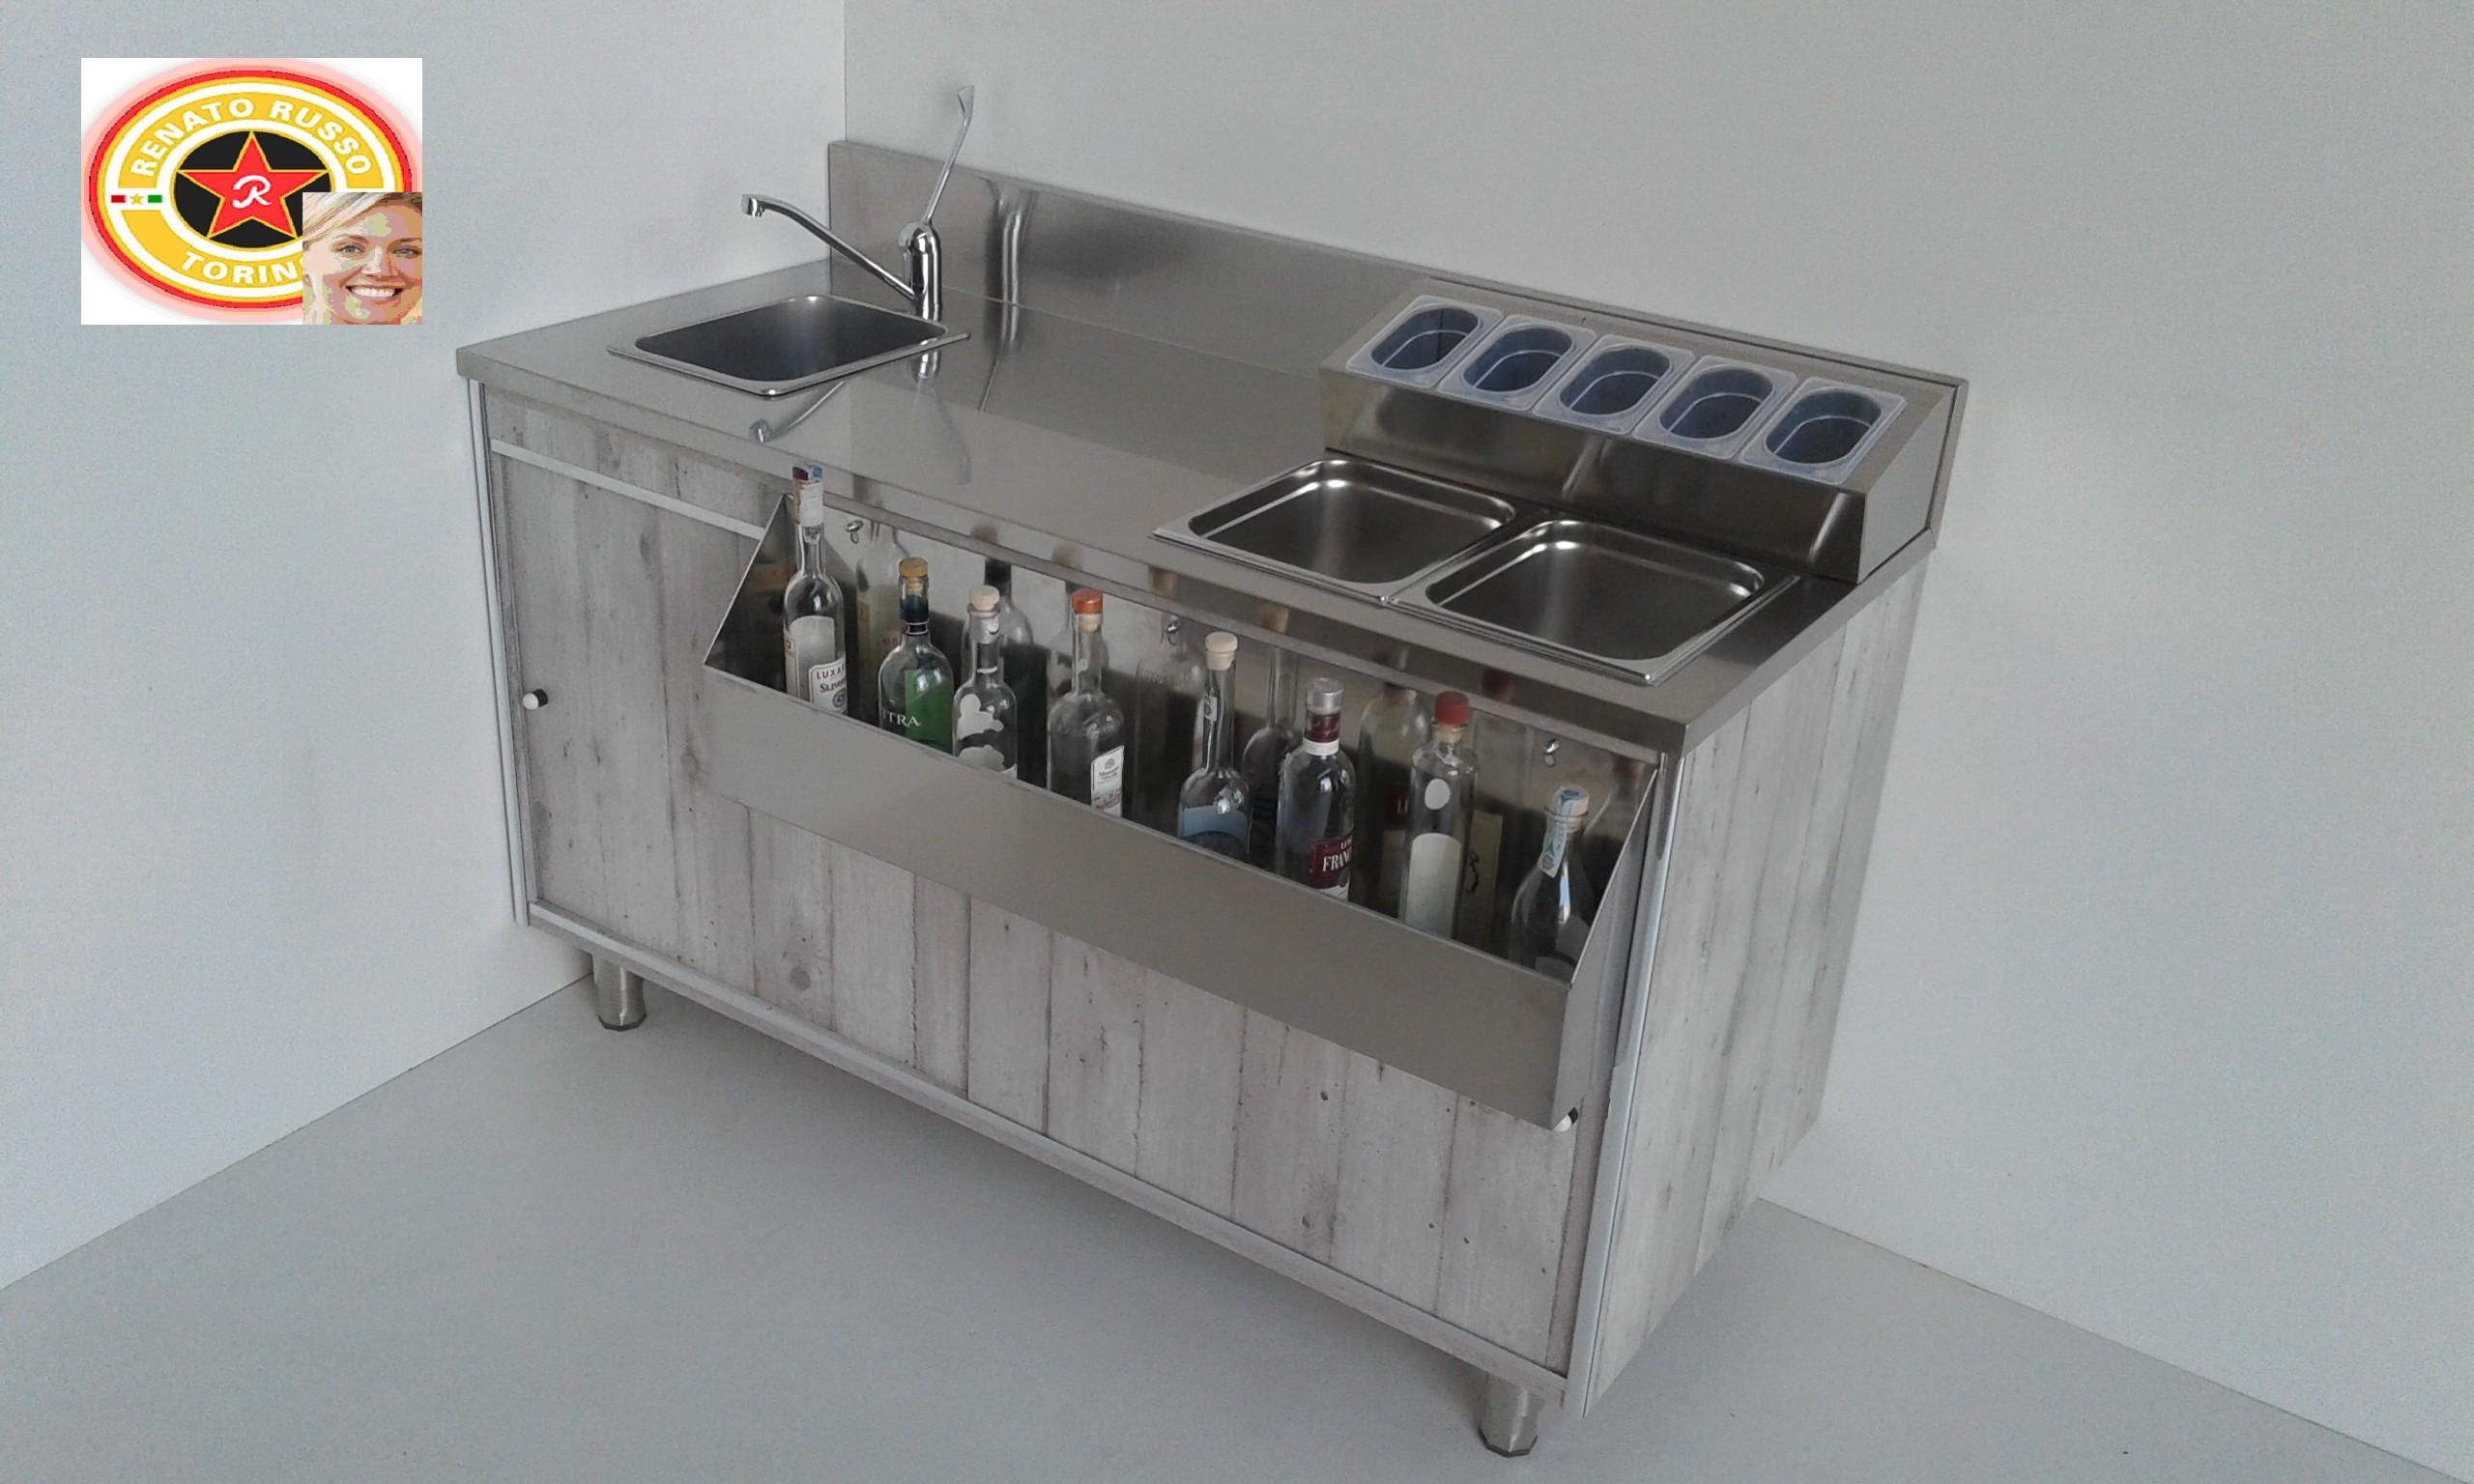 Arredamenti per negozi compra in fabbrica banconi per for Martini arredamenti